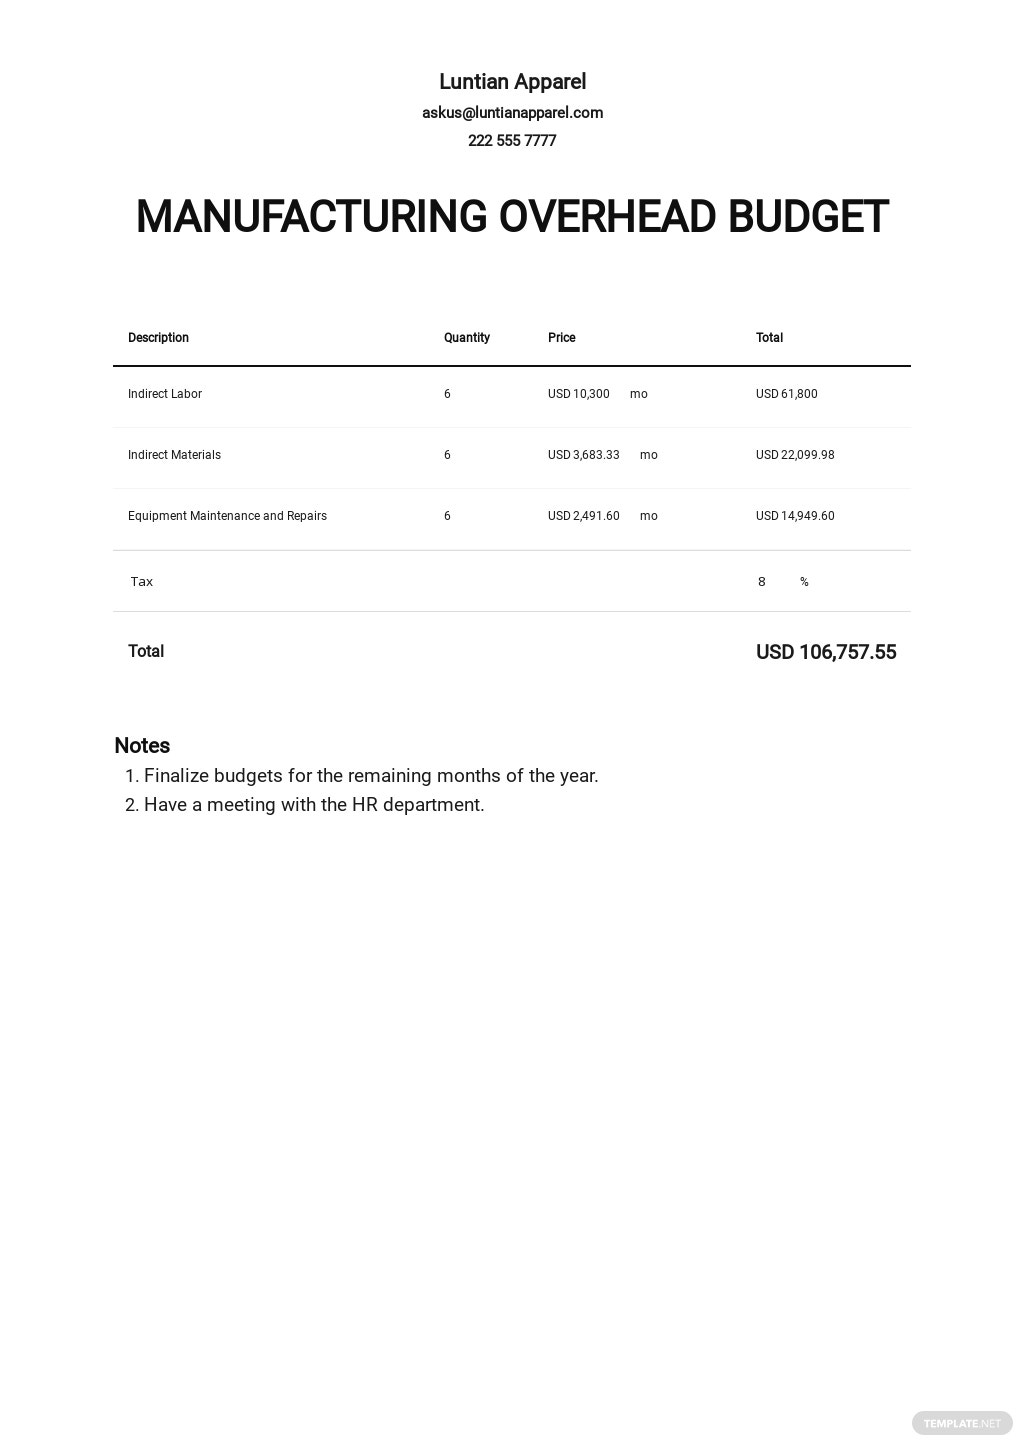 Manufacturing Overhead Budget Template.jpe